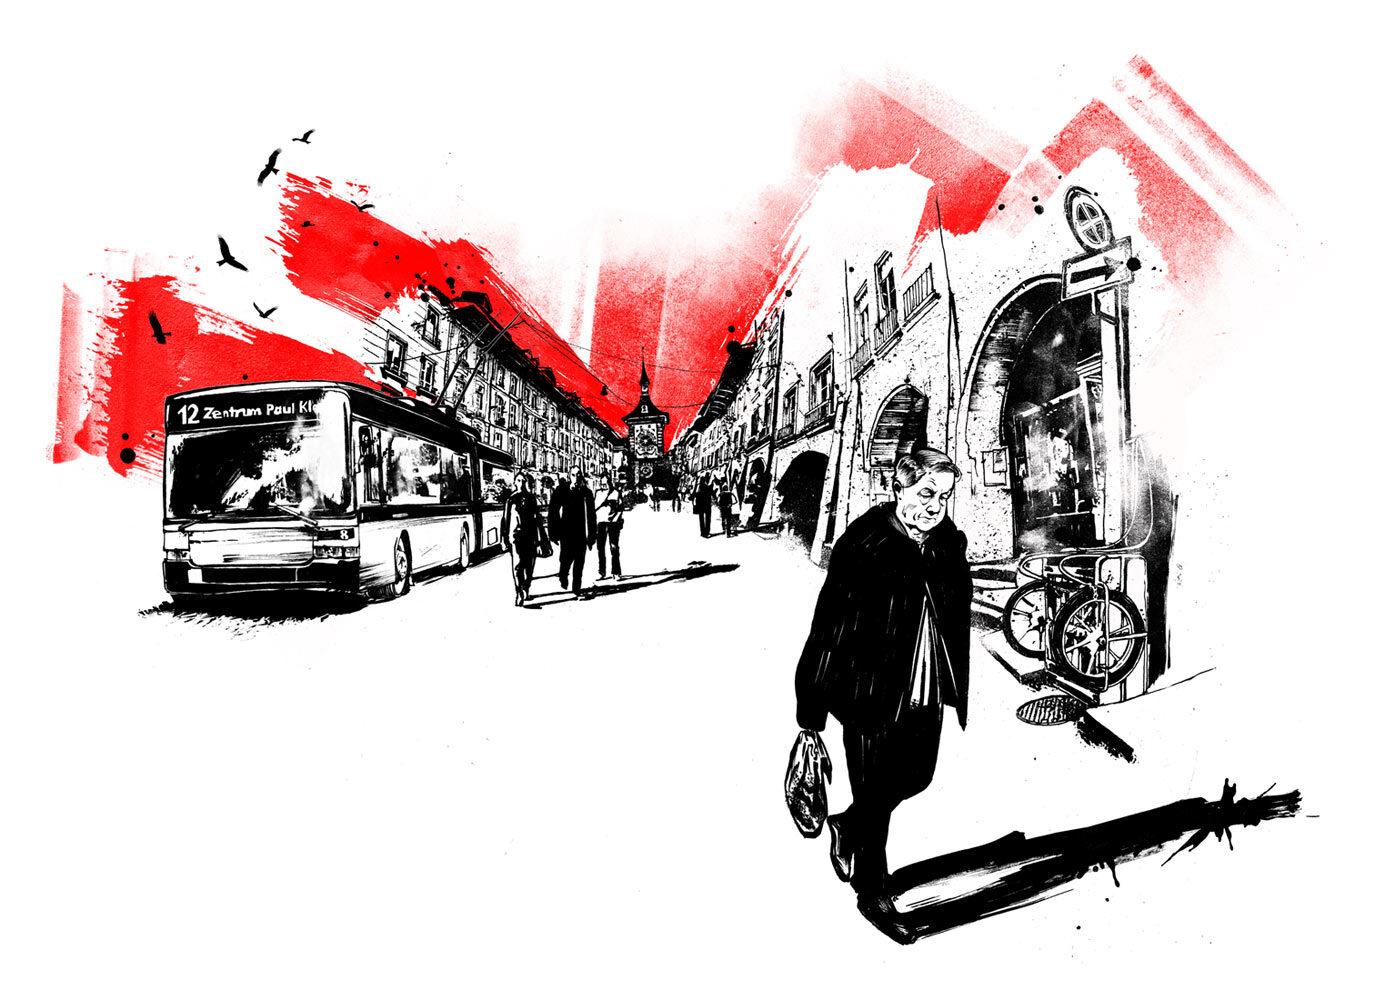 Galiano Stadtleben - Kornel Illustration | Kornel Stadler portfolio